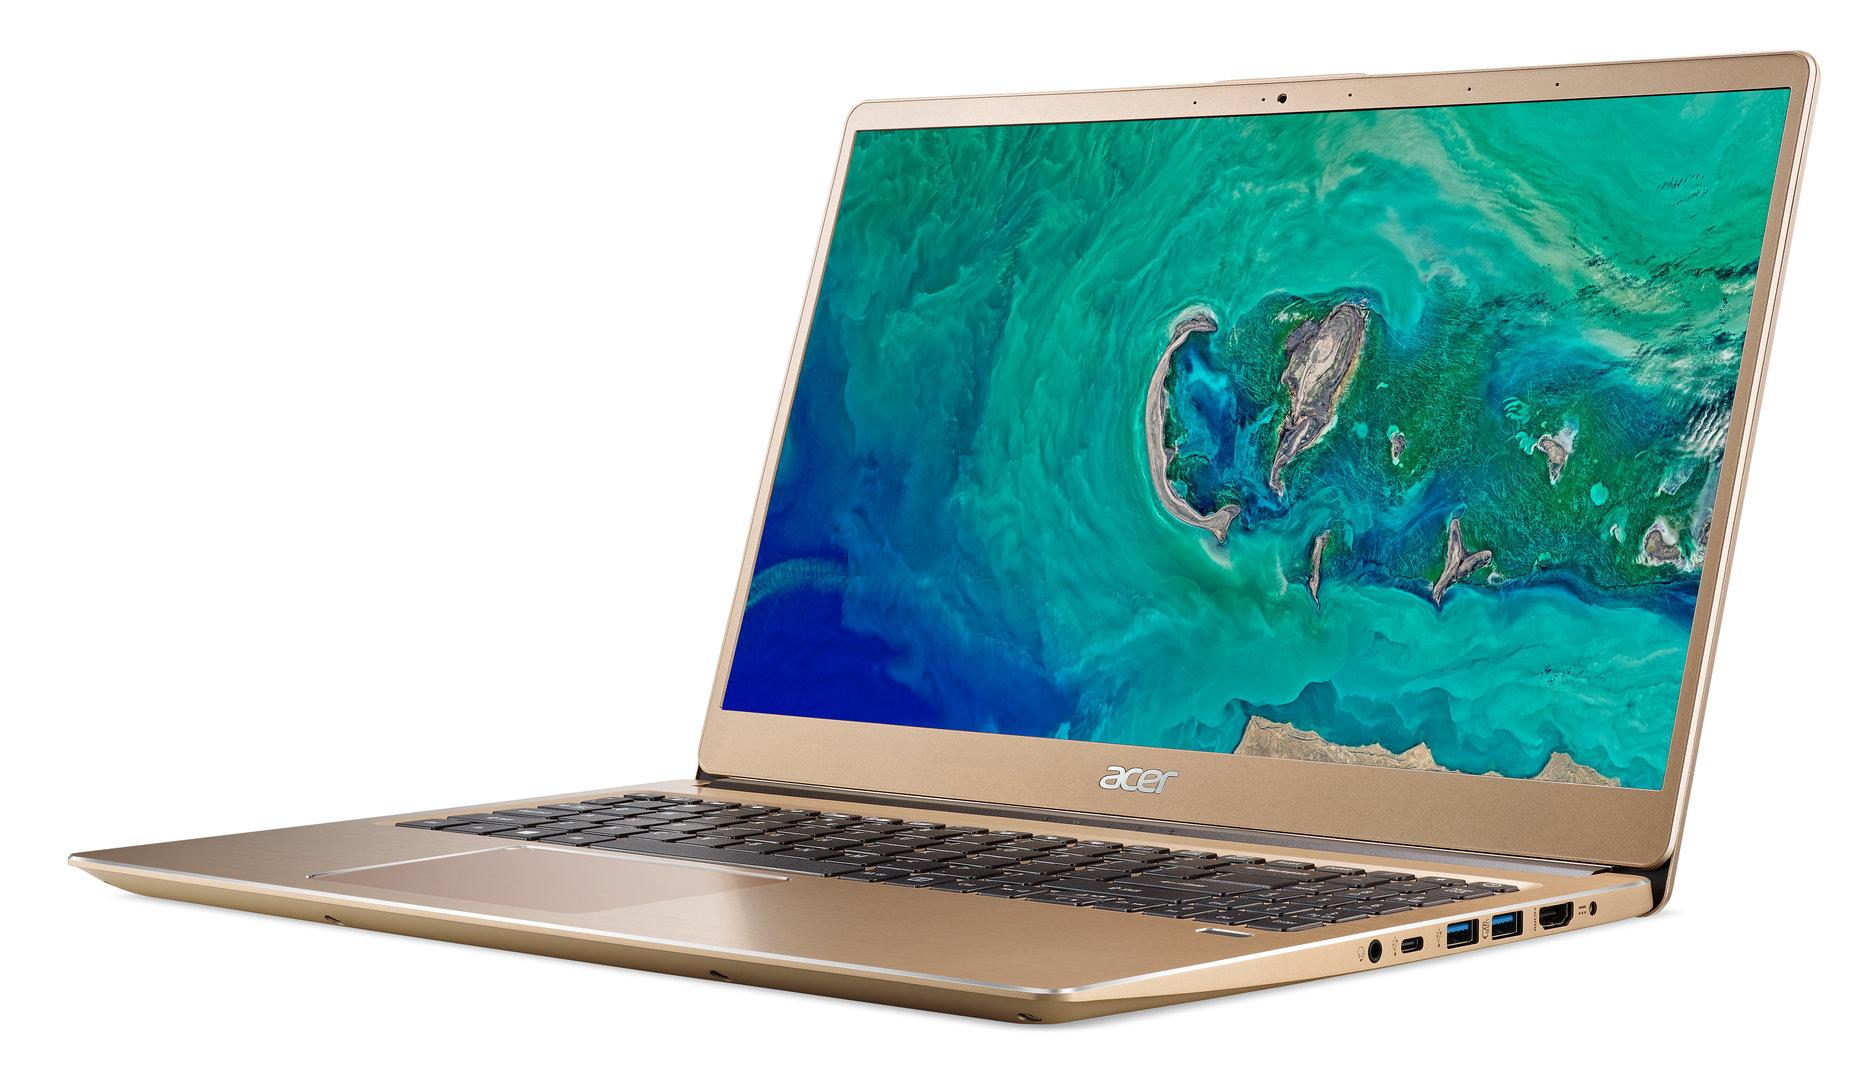 Acer Swift 3 (2018) (15,6 Zoll) (Gold)